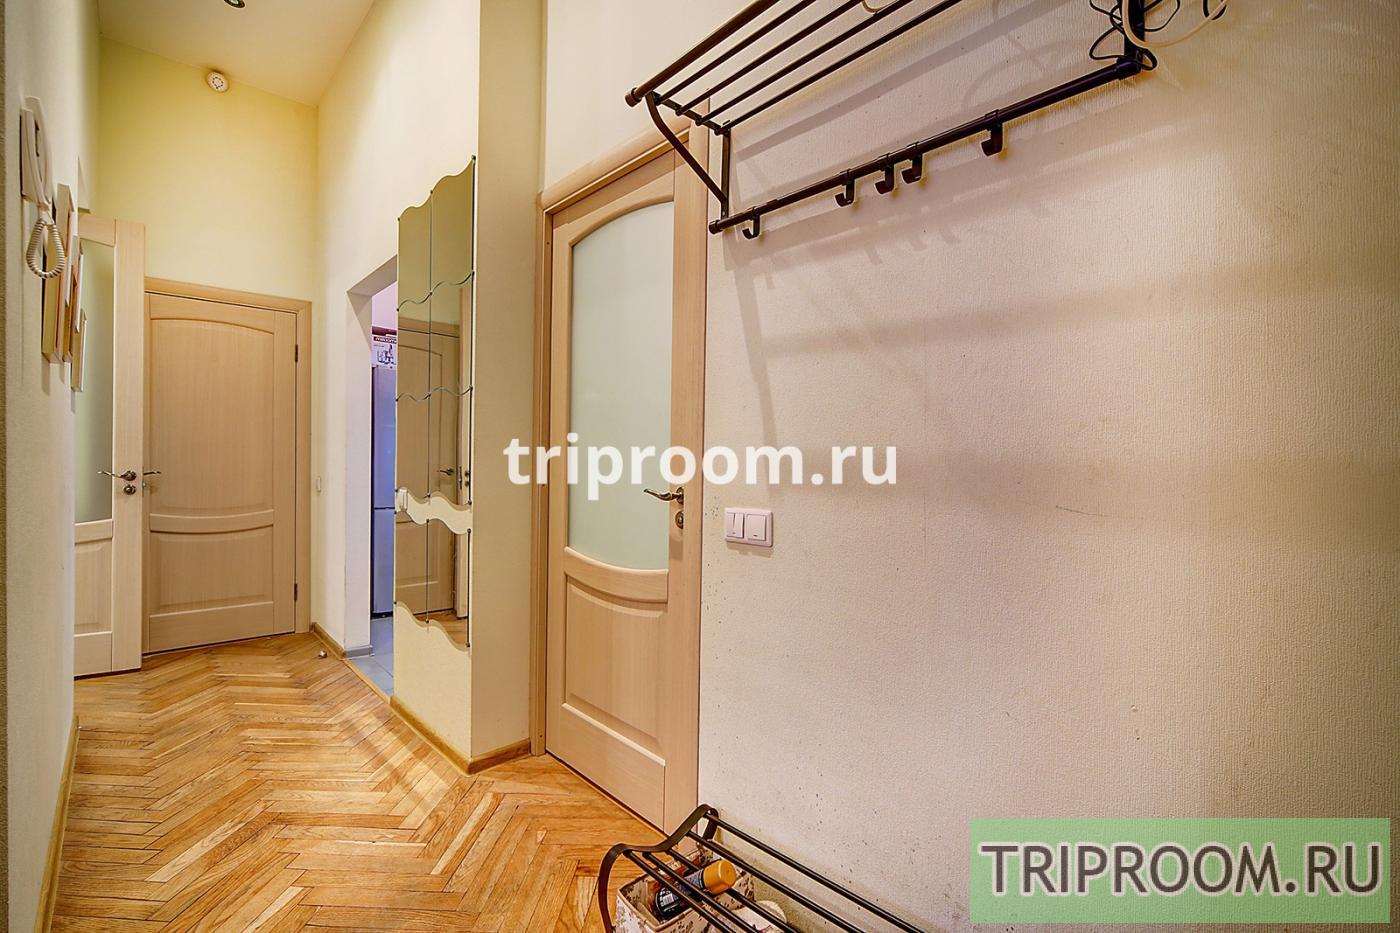 2-комнатная квартира посуточно (вариант № 15426), ул. Лиговский проспект, фото № 26